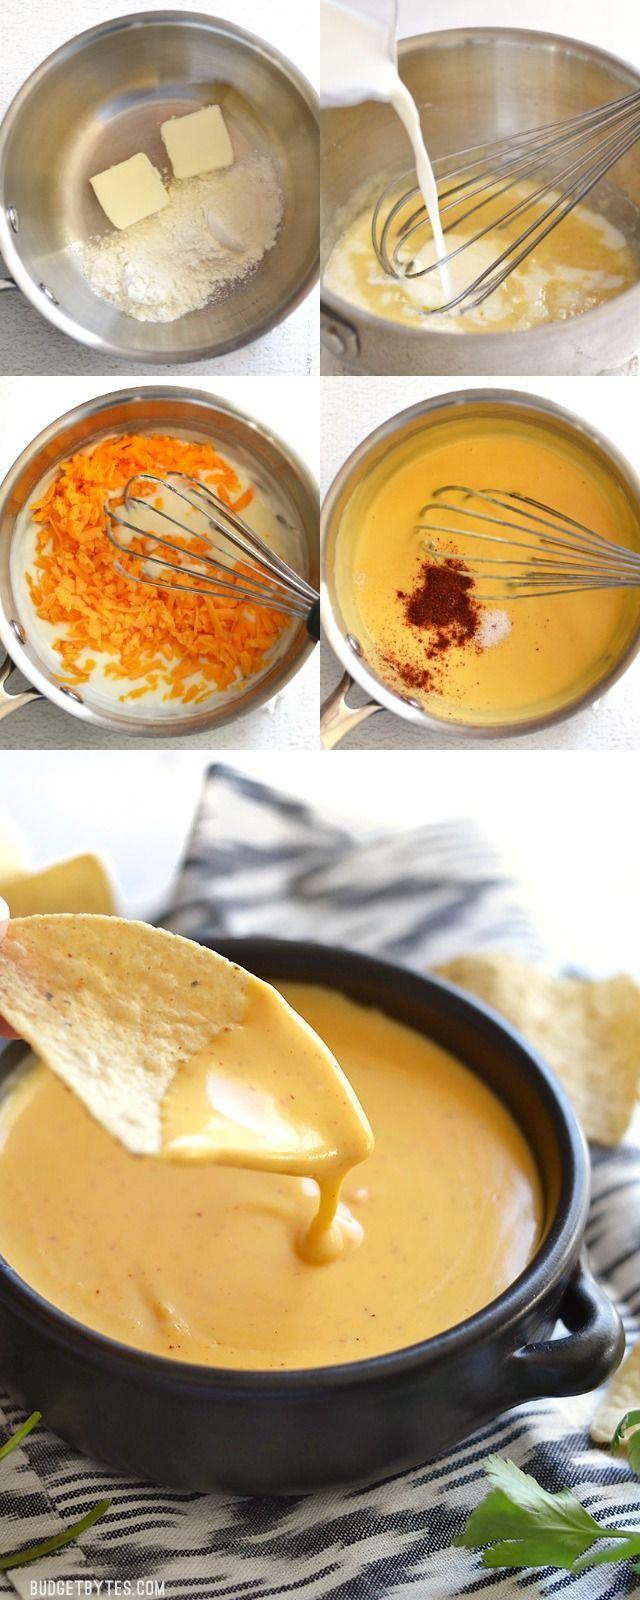 5 Minute Nacho Cheese Sauce   Budget Bytes   Bloglovin'